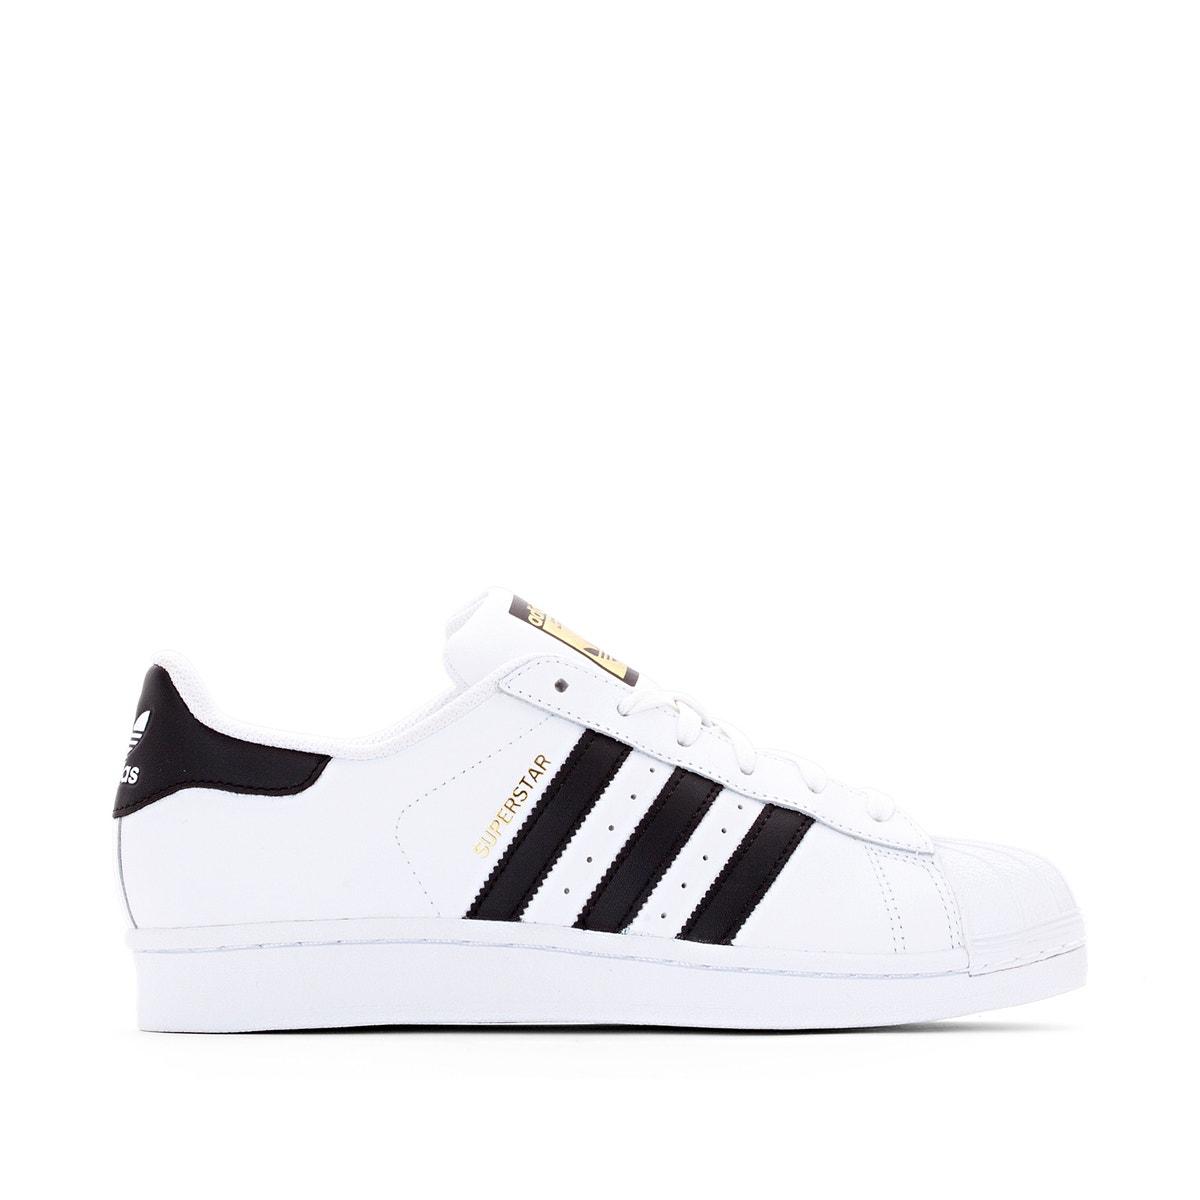 Adidas Originals Superstar - Sneakers - ΛΕΥΚΟ/ΜΑΥΡΟ